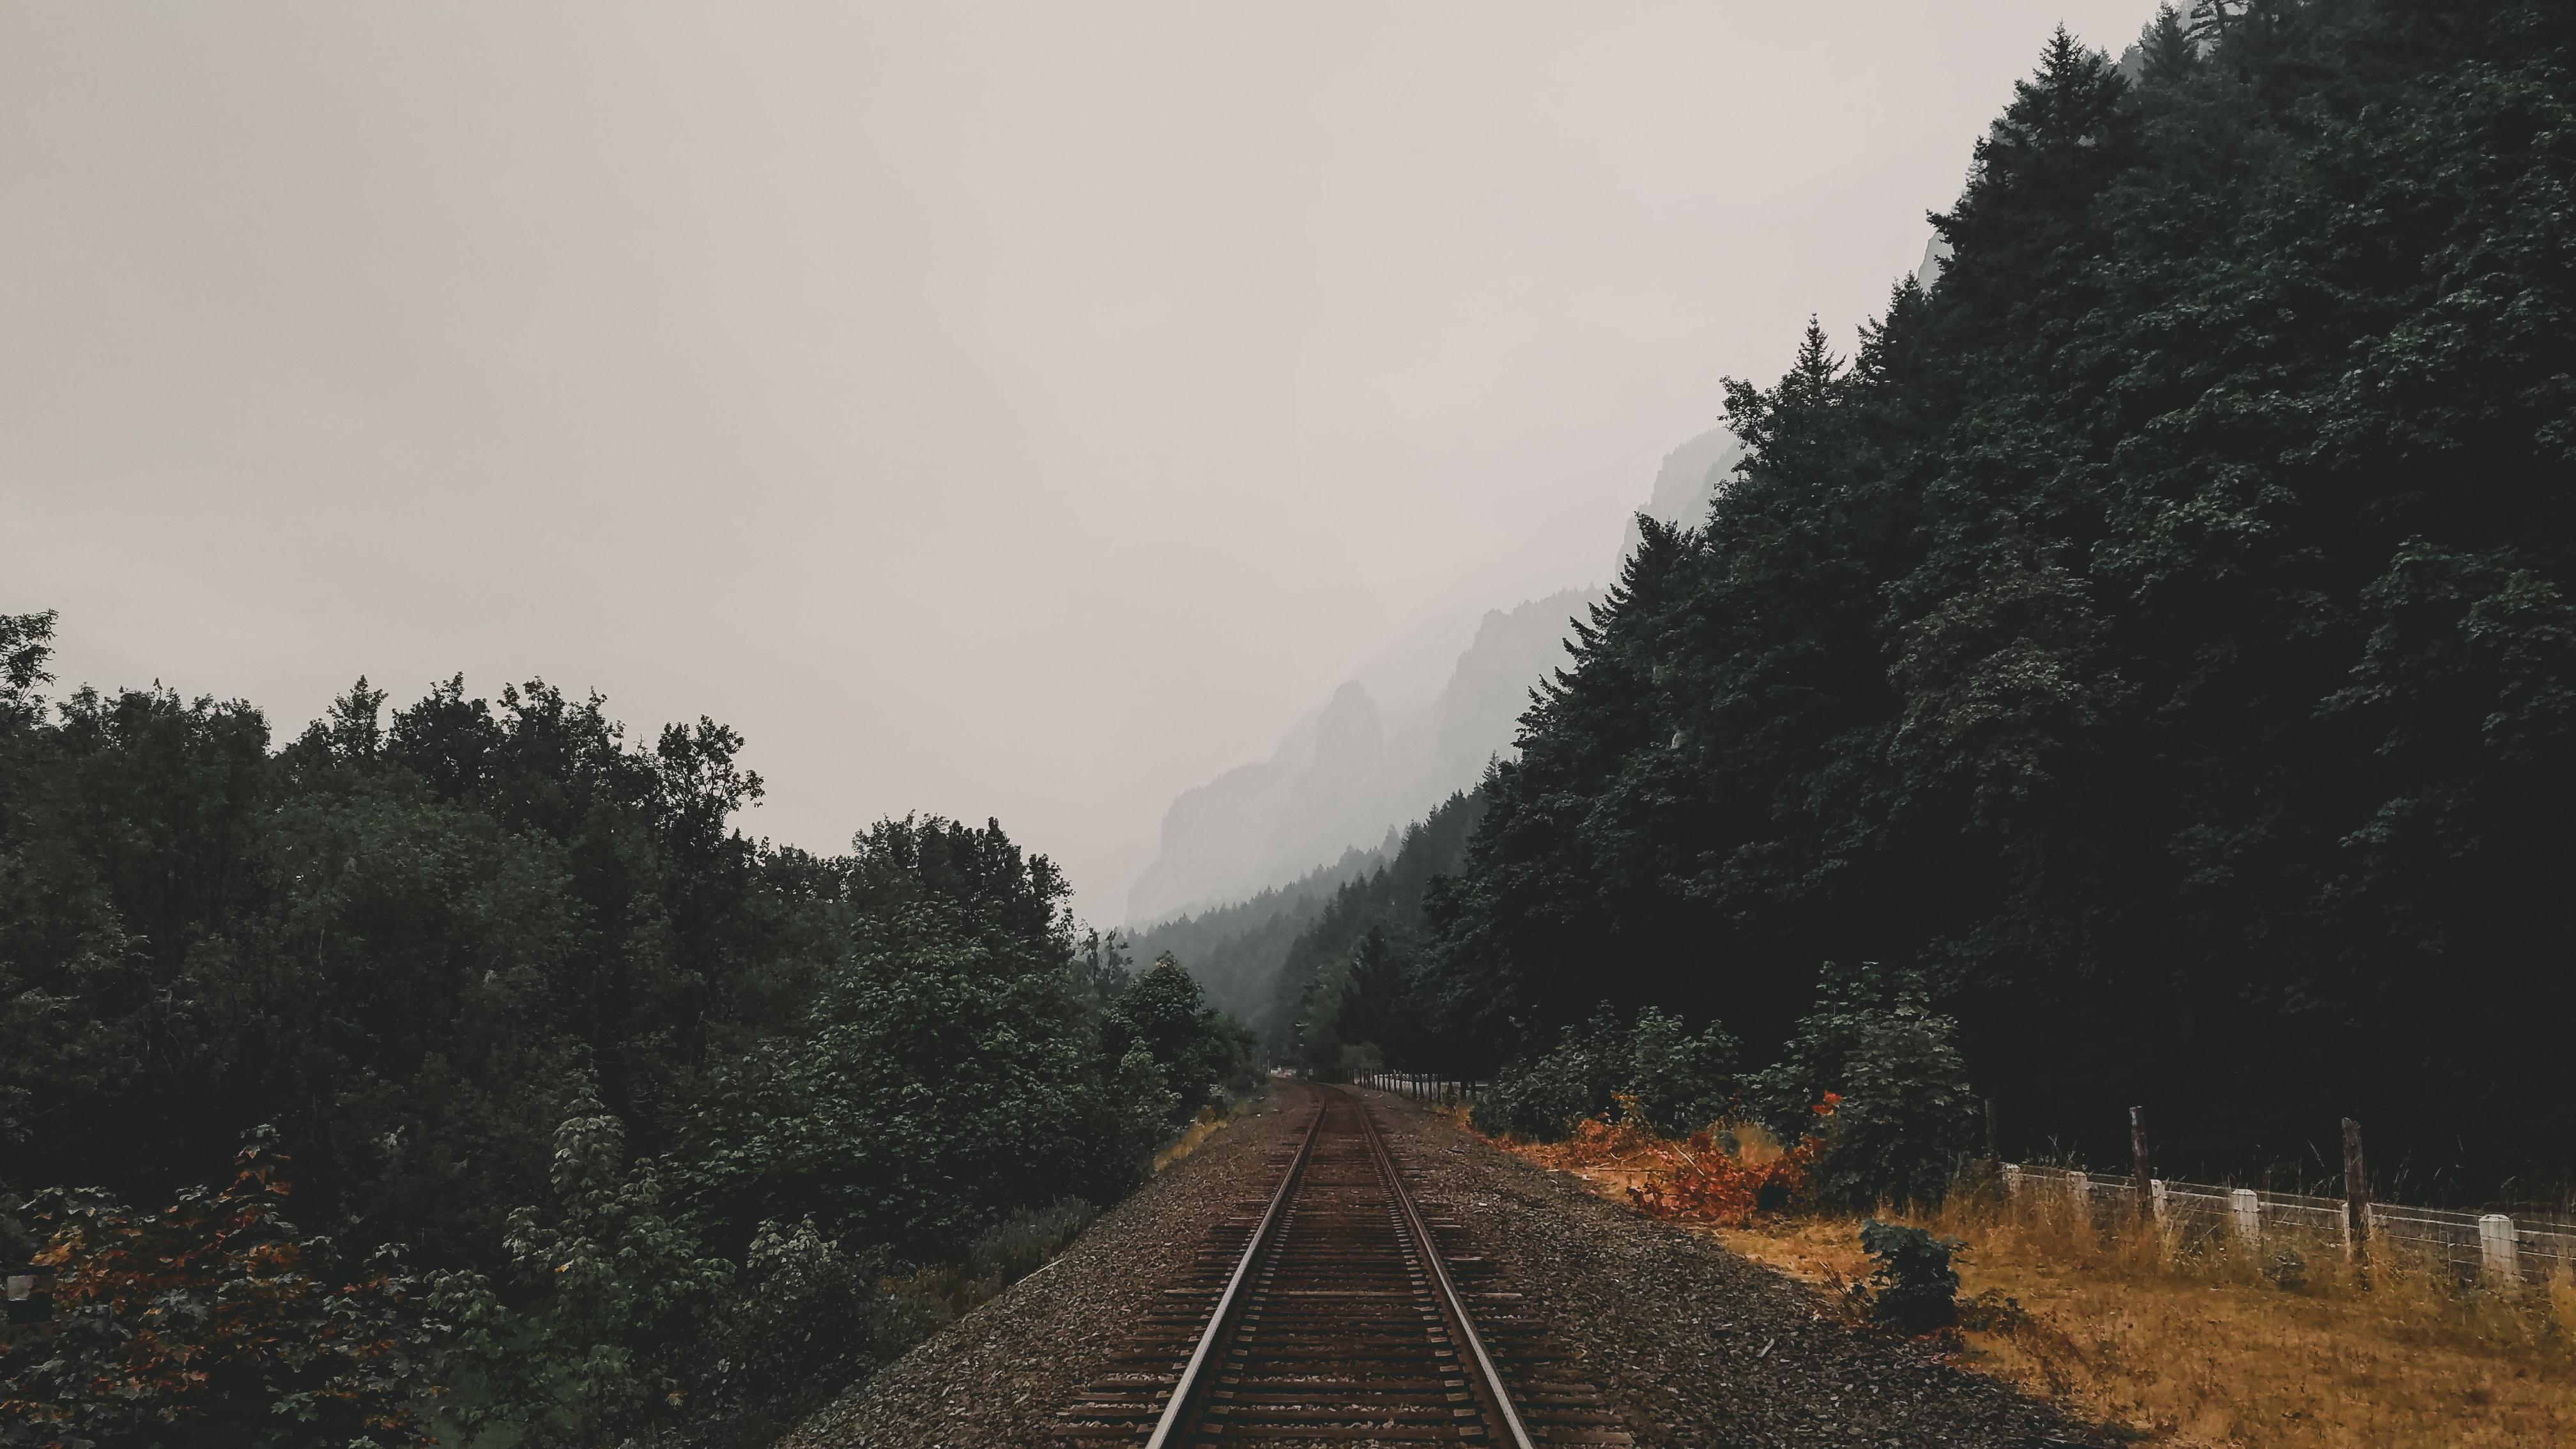 train rails between green trees under cloudy sky